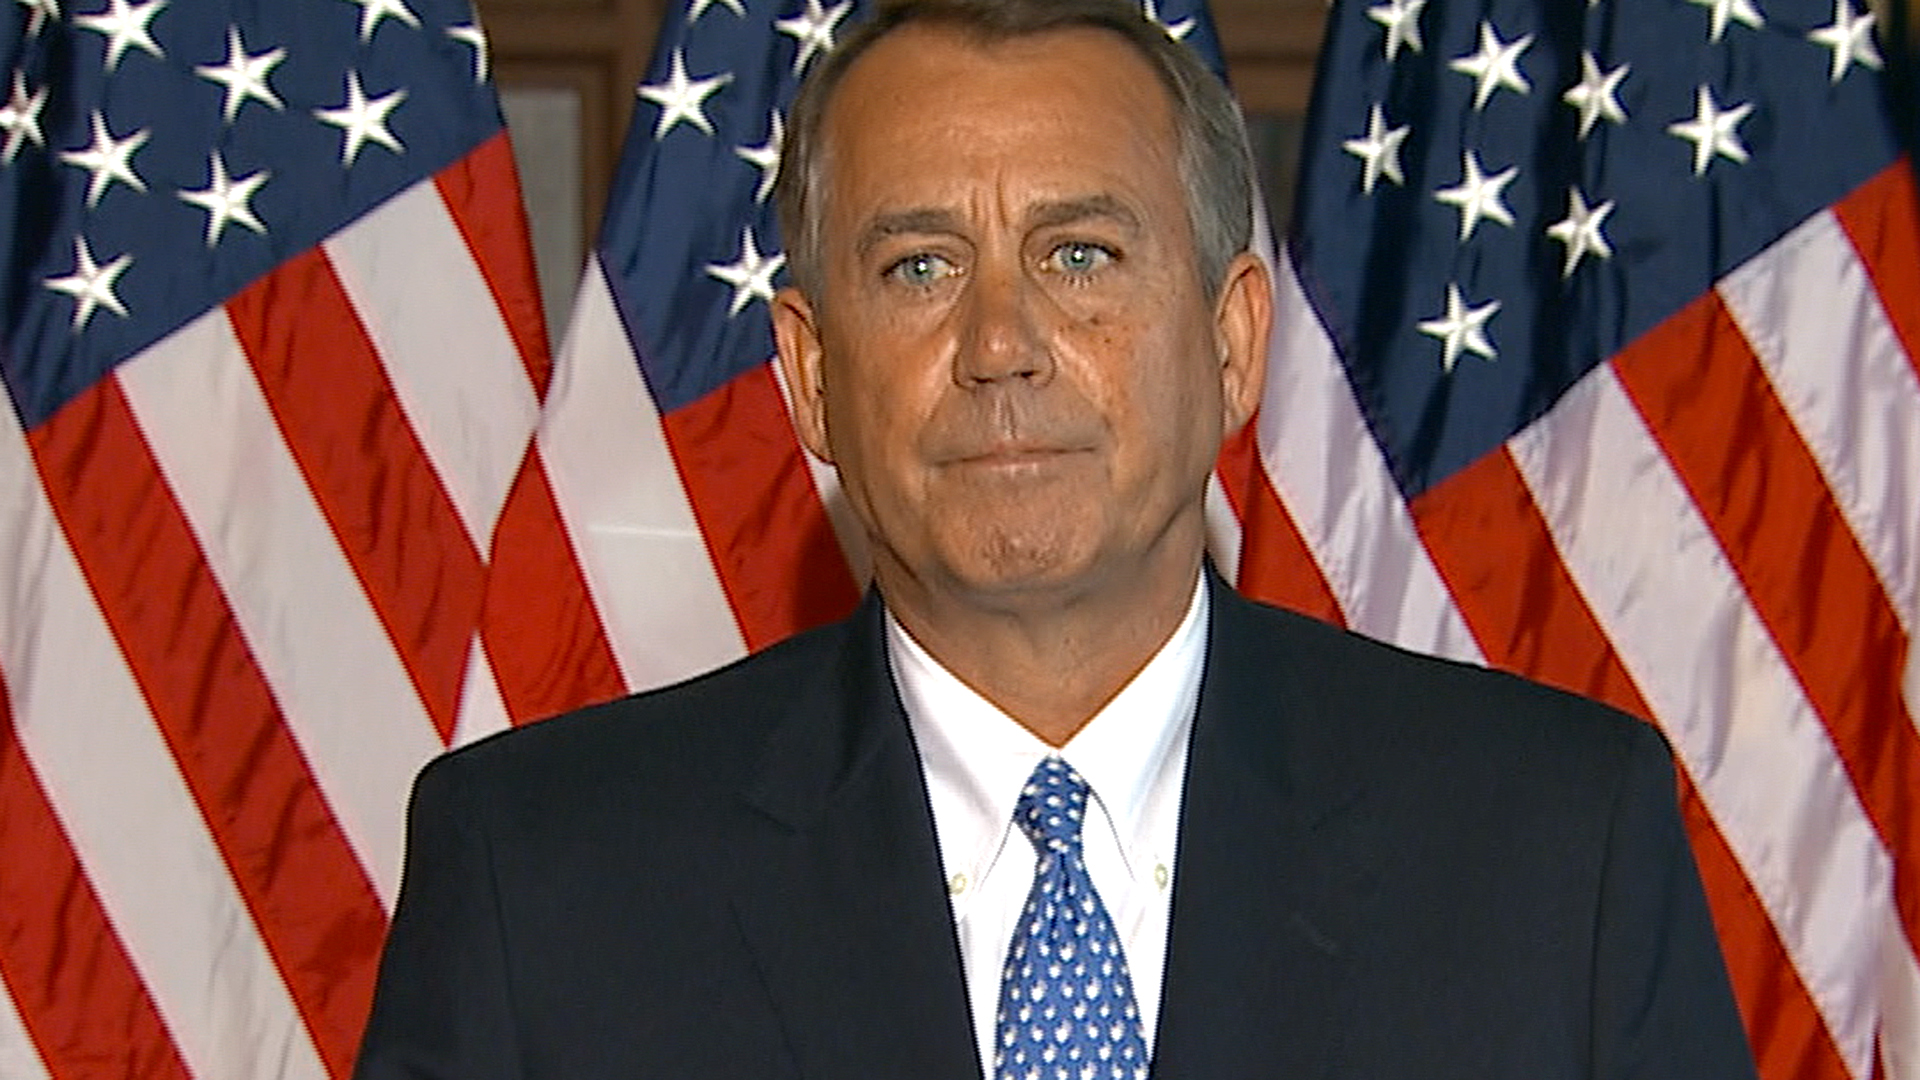 Boehner: 'It's disgraceful' military families denied death benefits